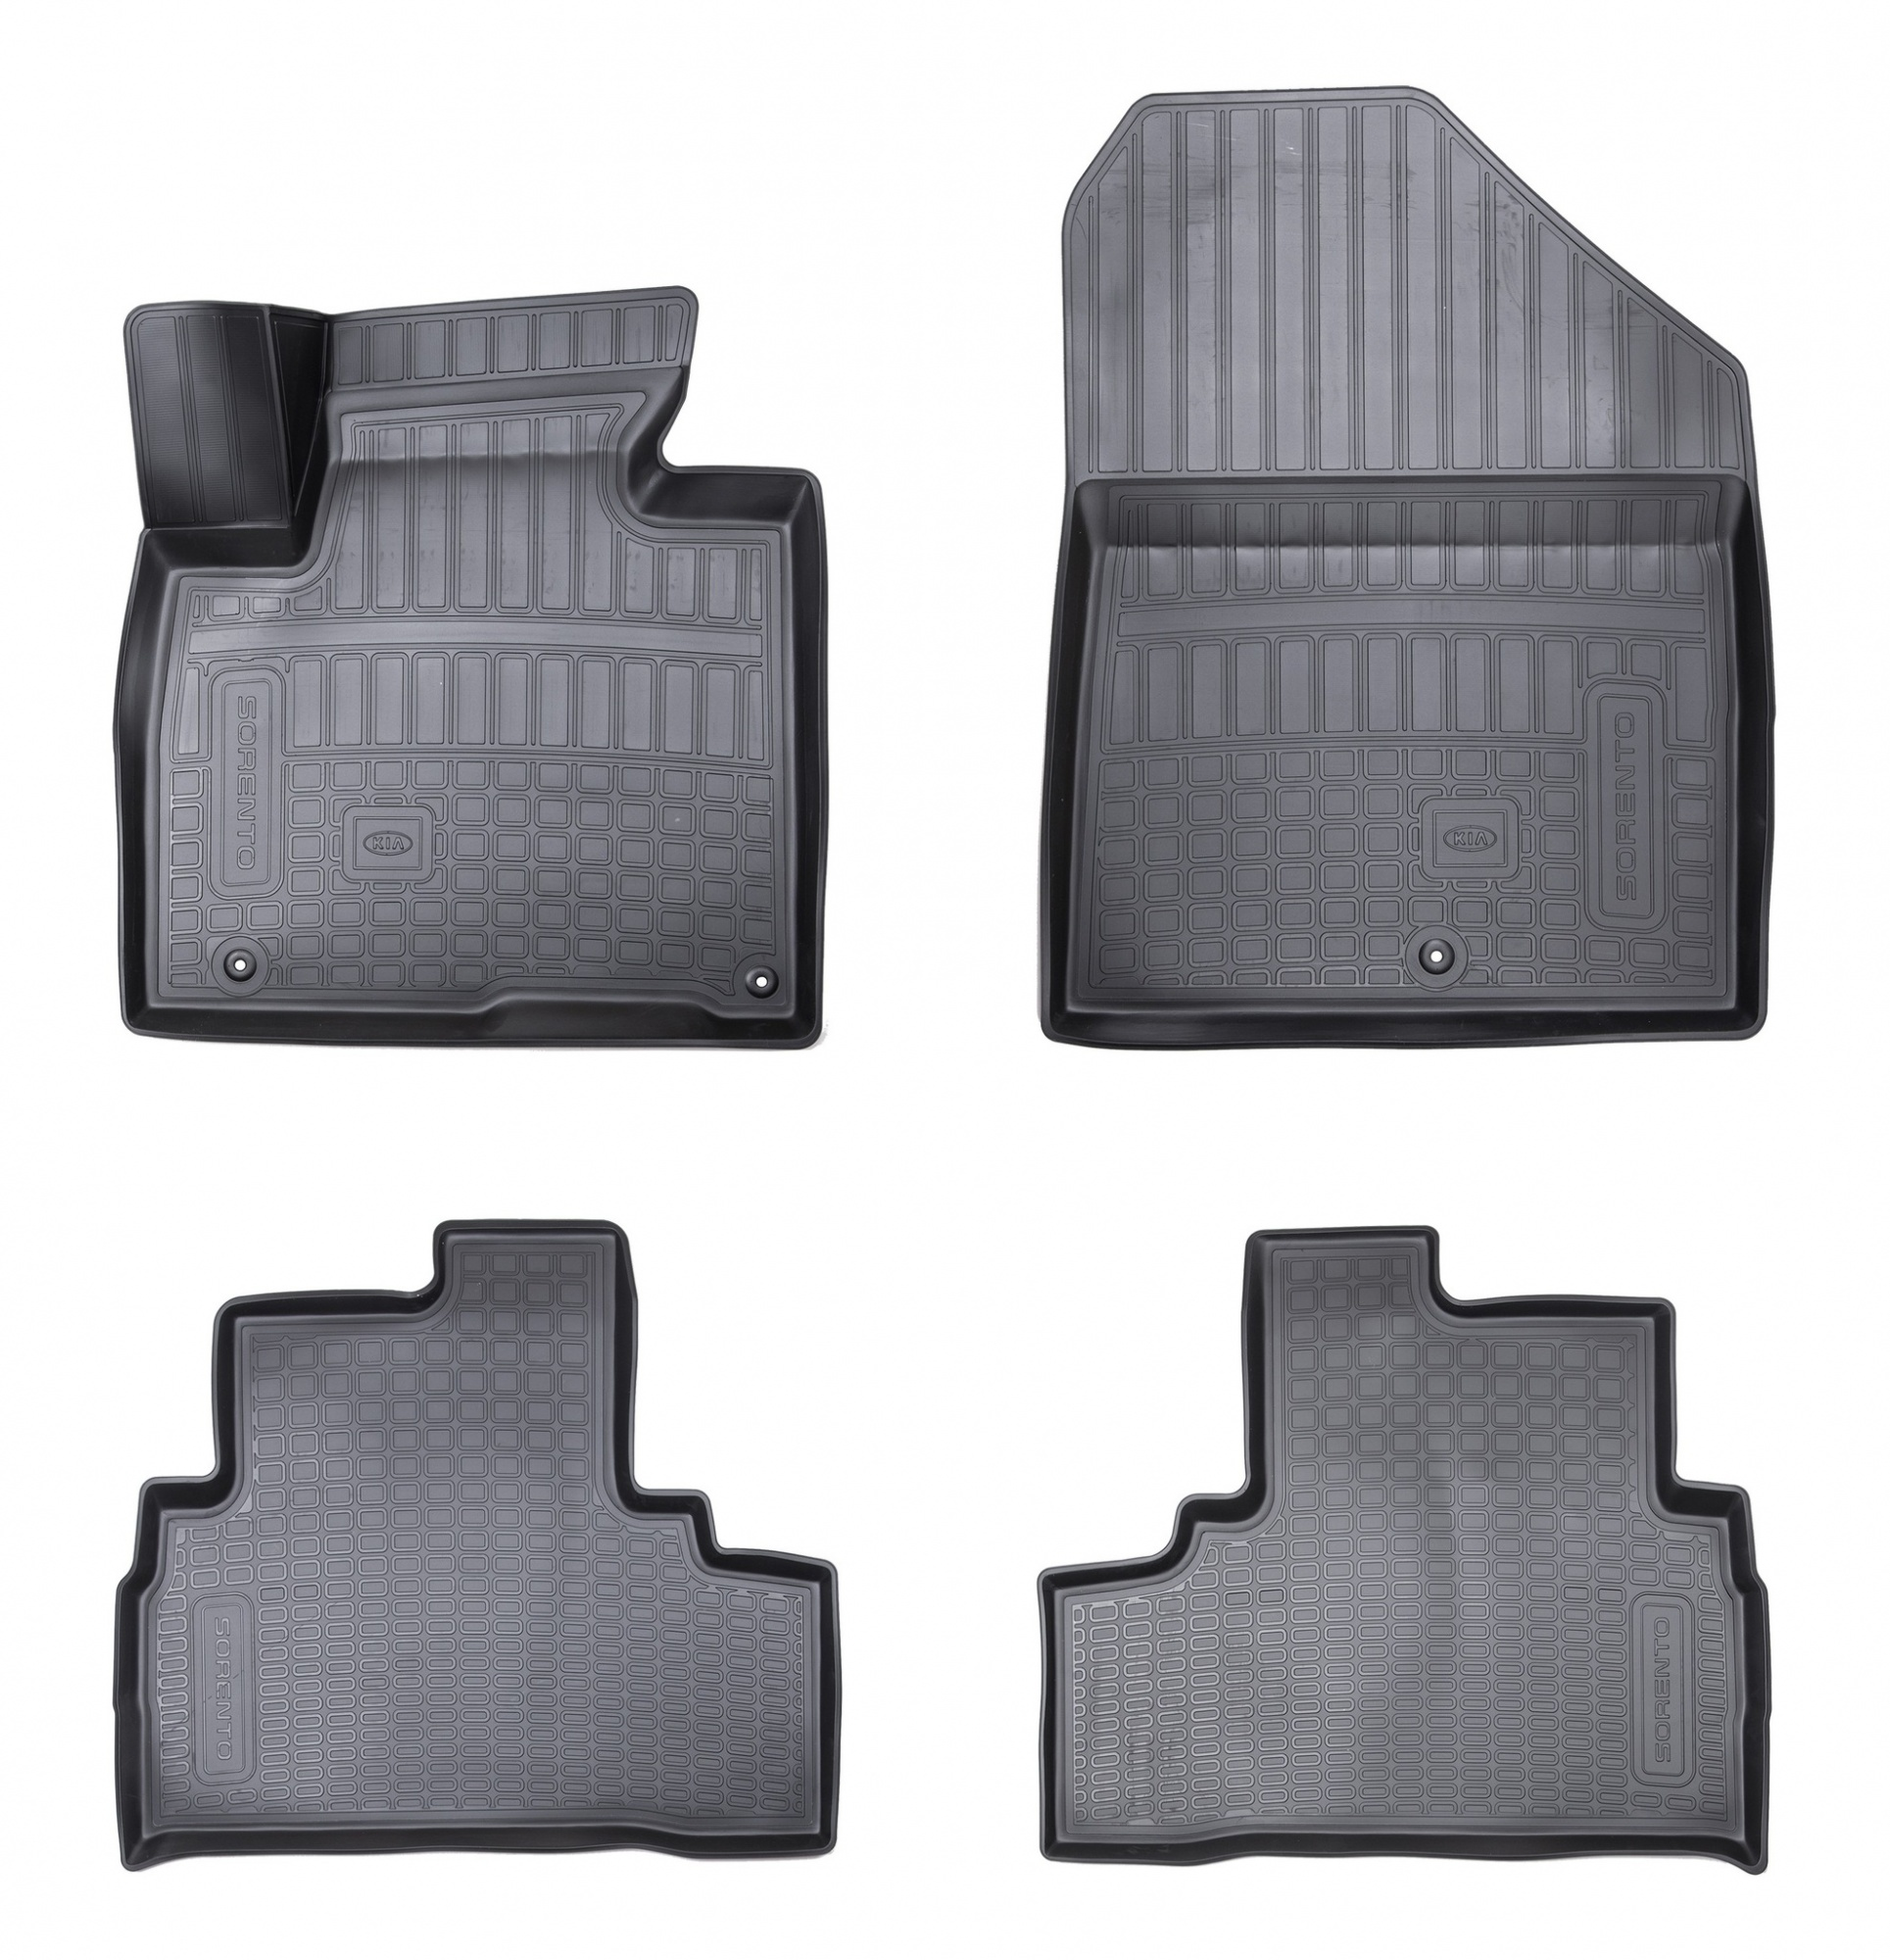 Коврики в салон Hyundai/KIA черный R8130C5100 KIA Sorento (3G) Prime 2014- коврики в салон hyundai kia велюр черный a2143ade00st kia ceed 3g 2018